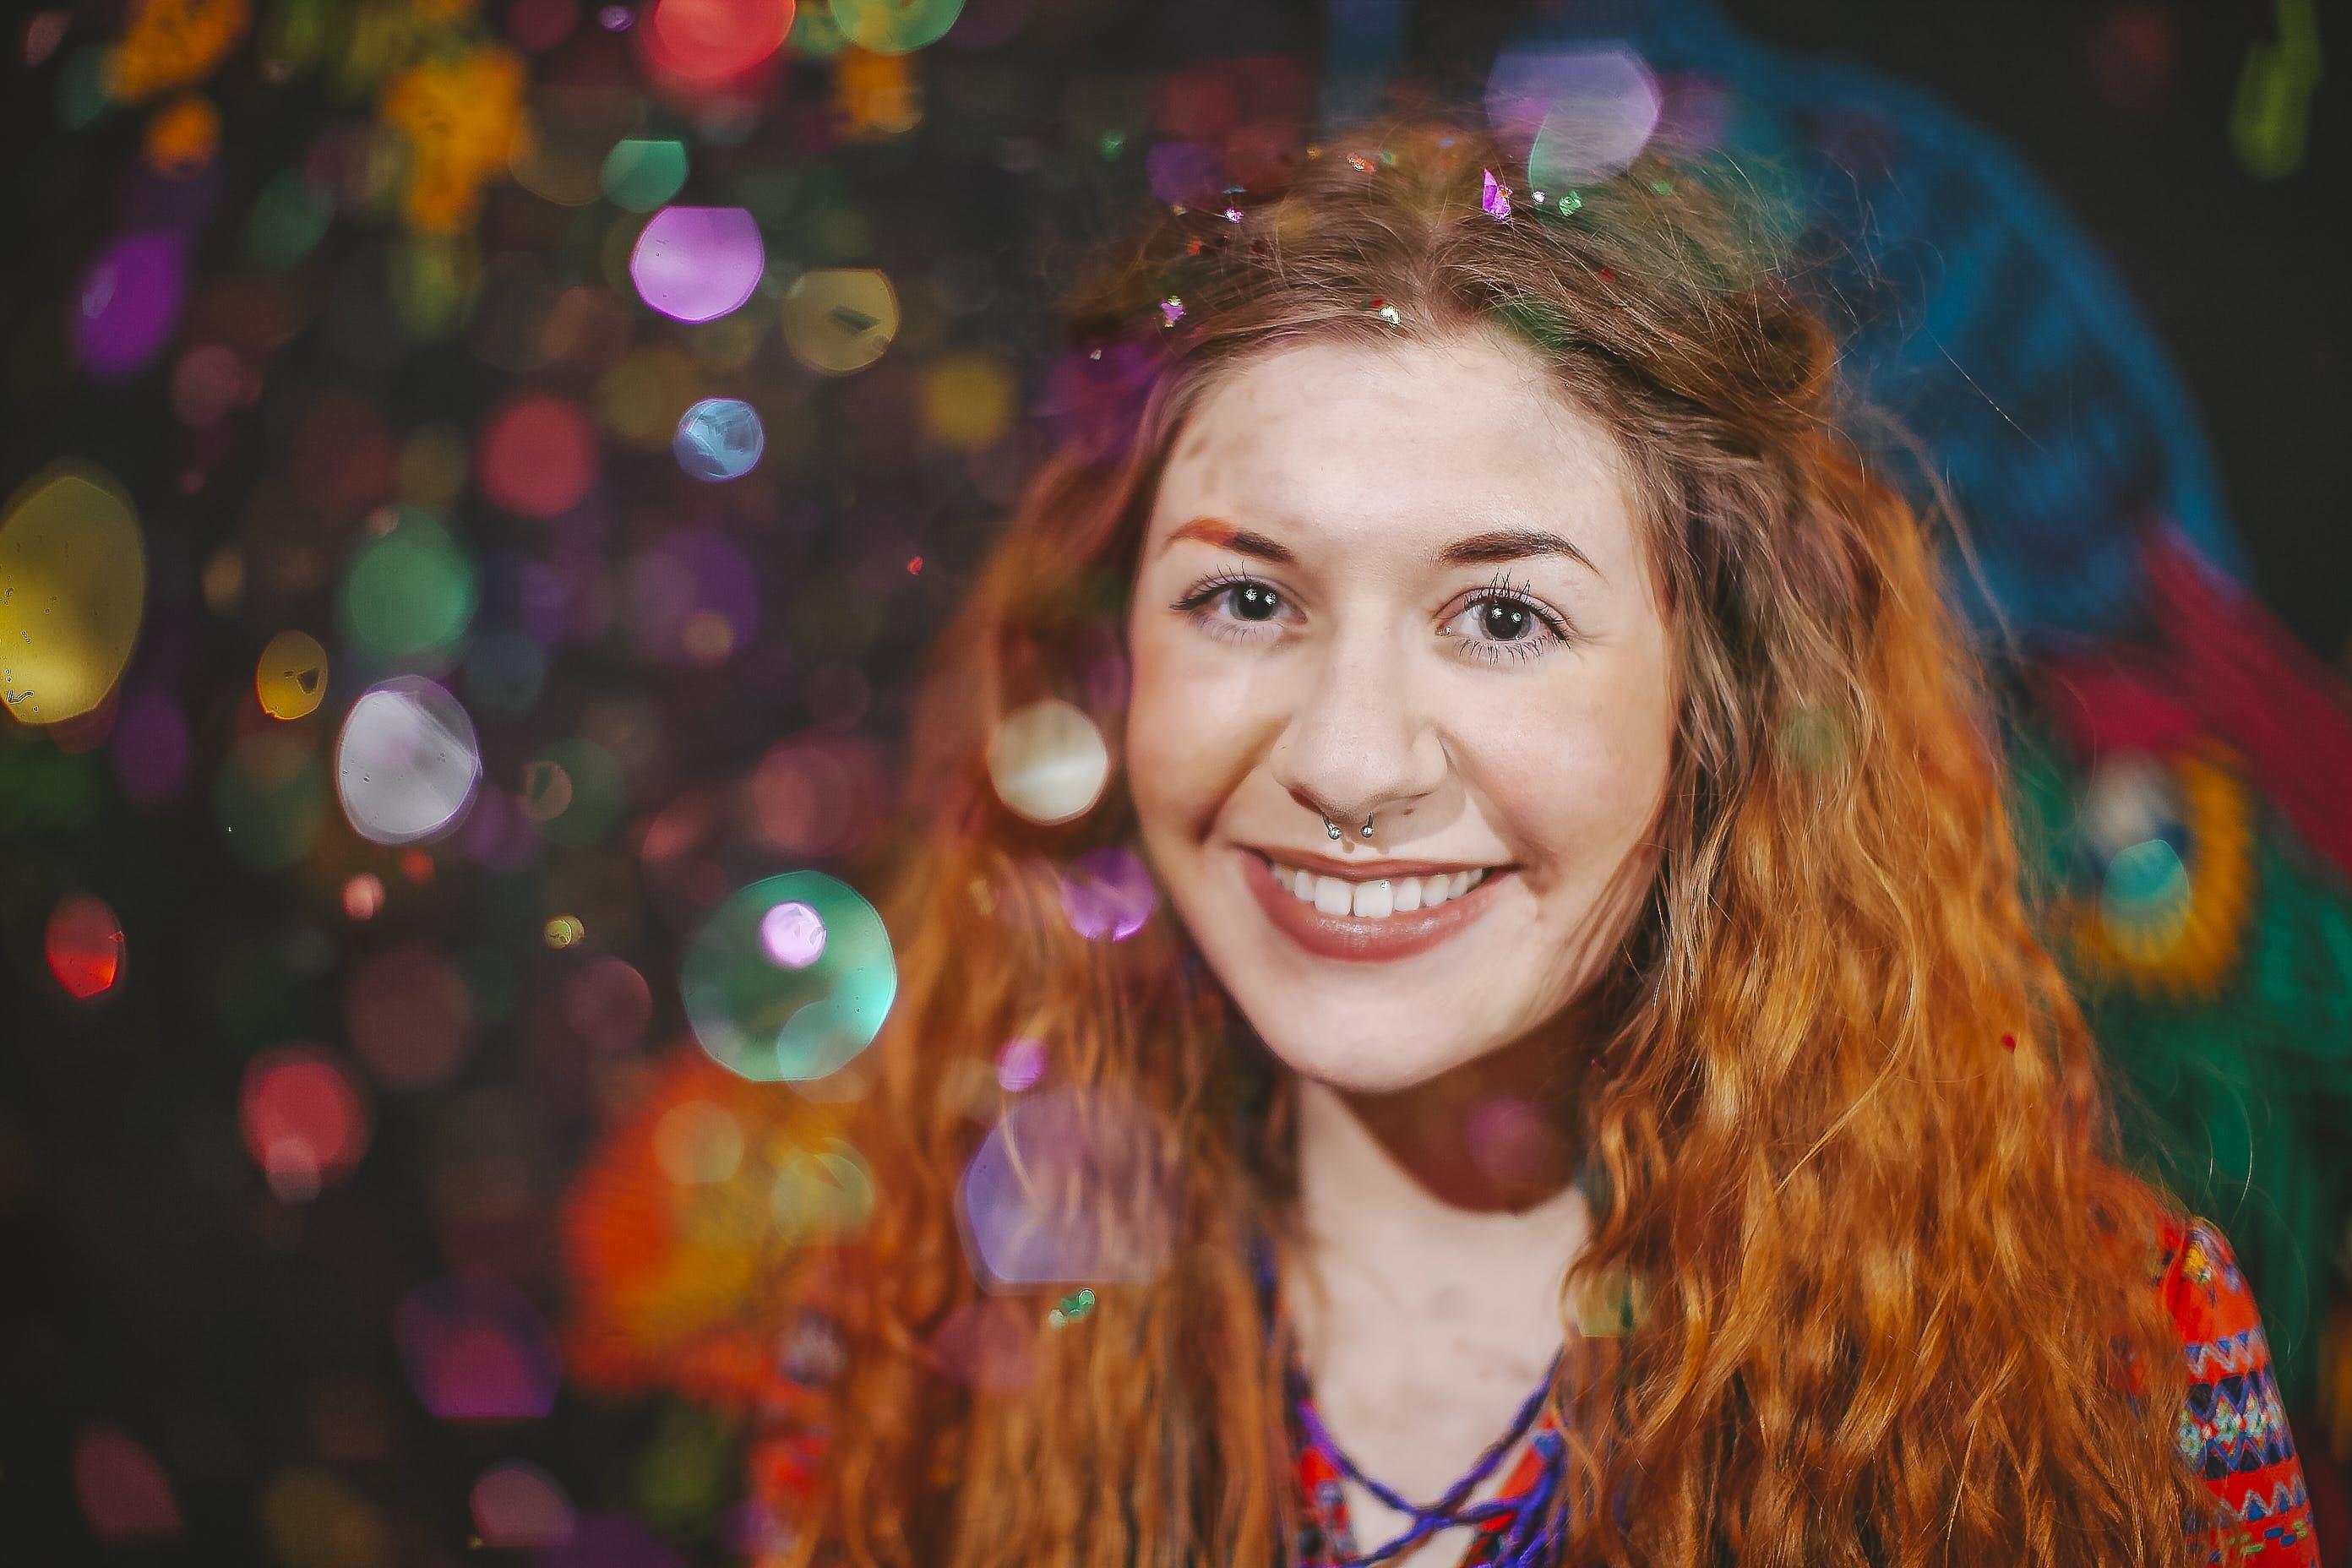 Woman With Orange Hair Smiling